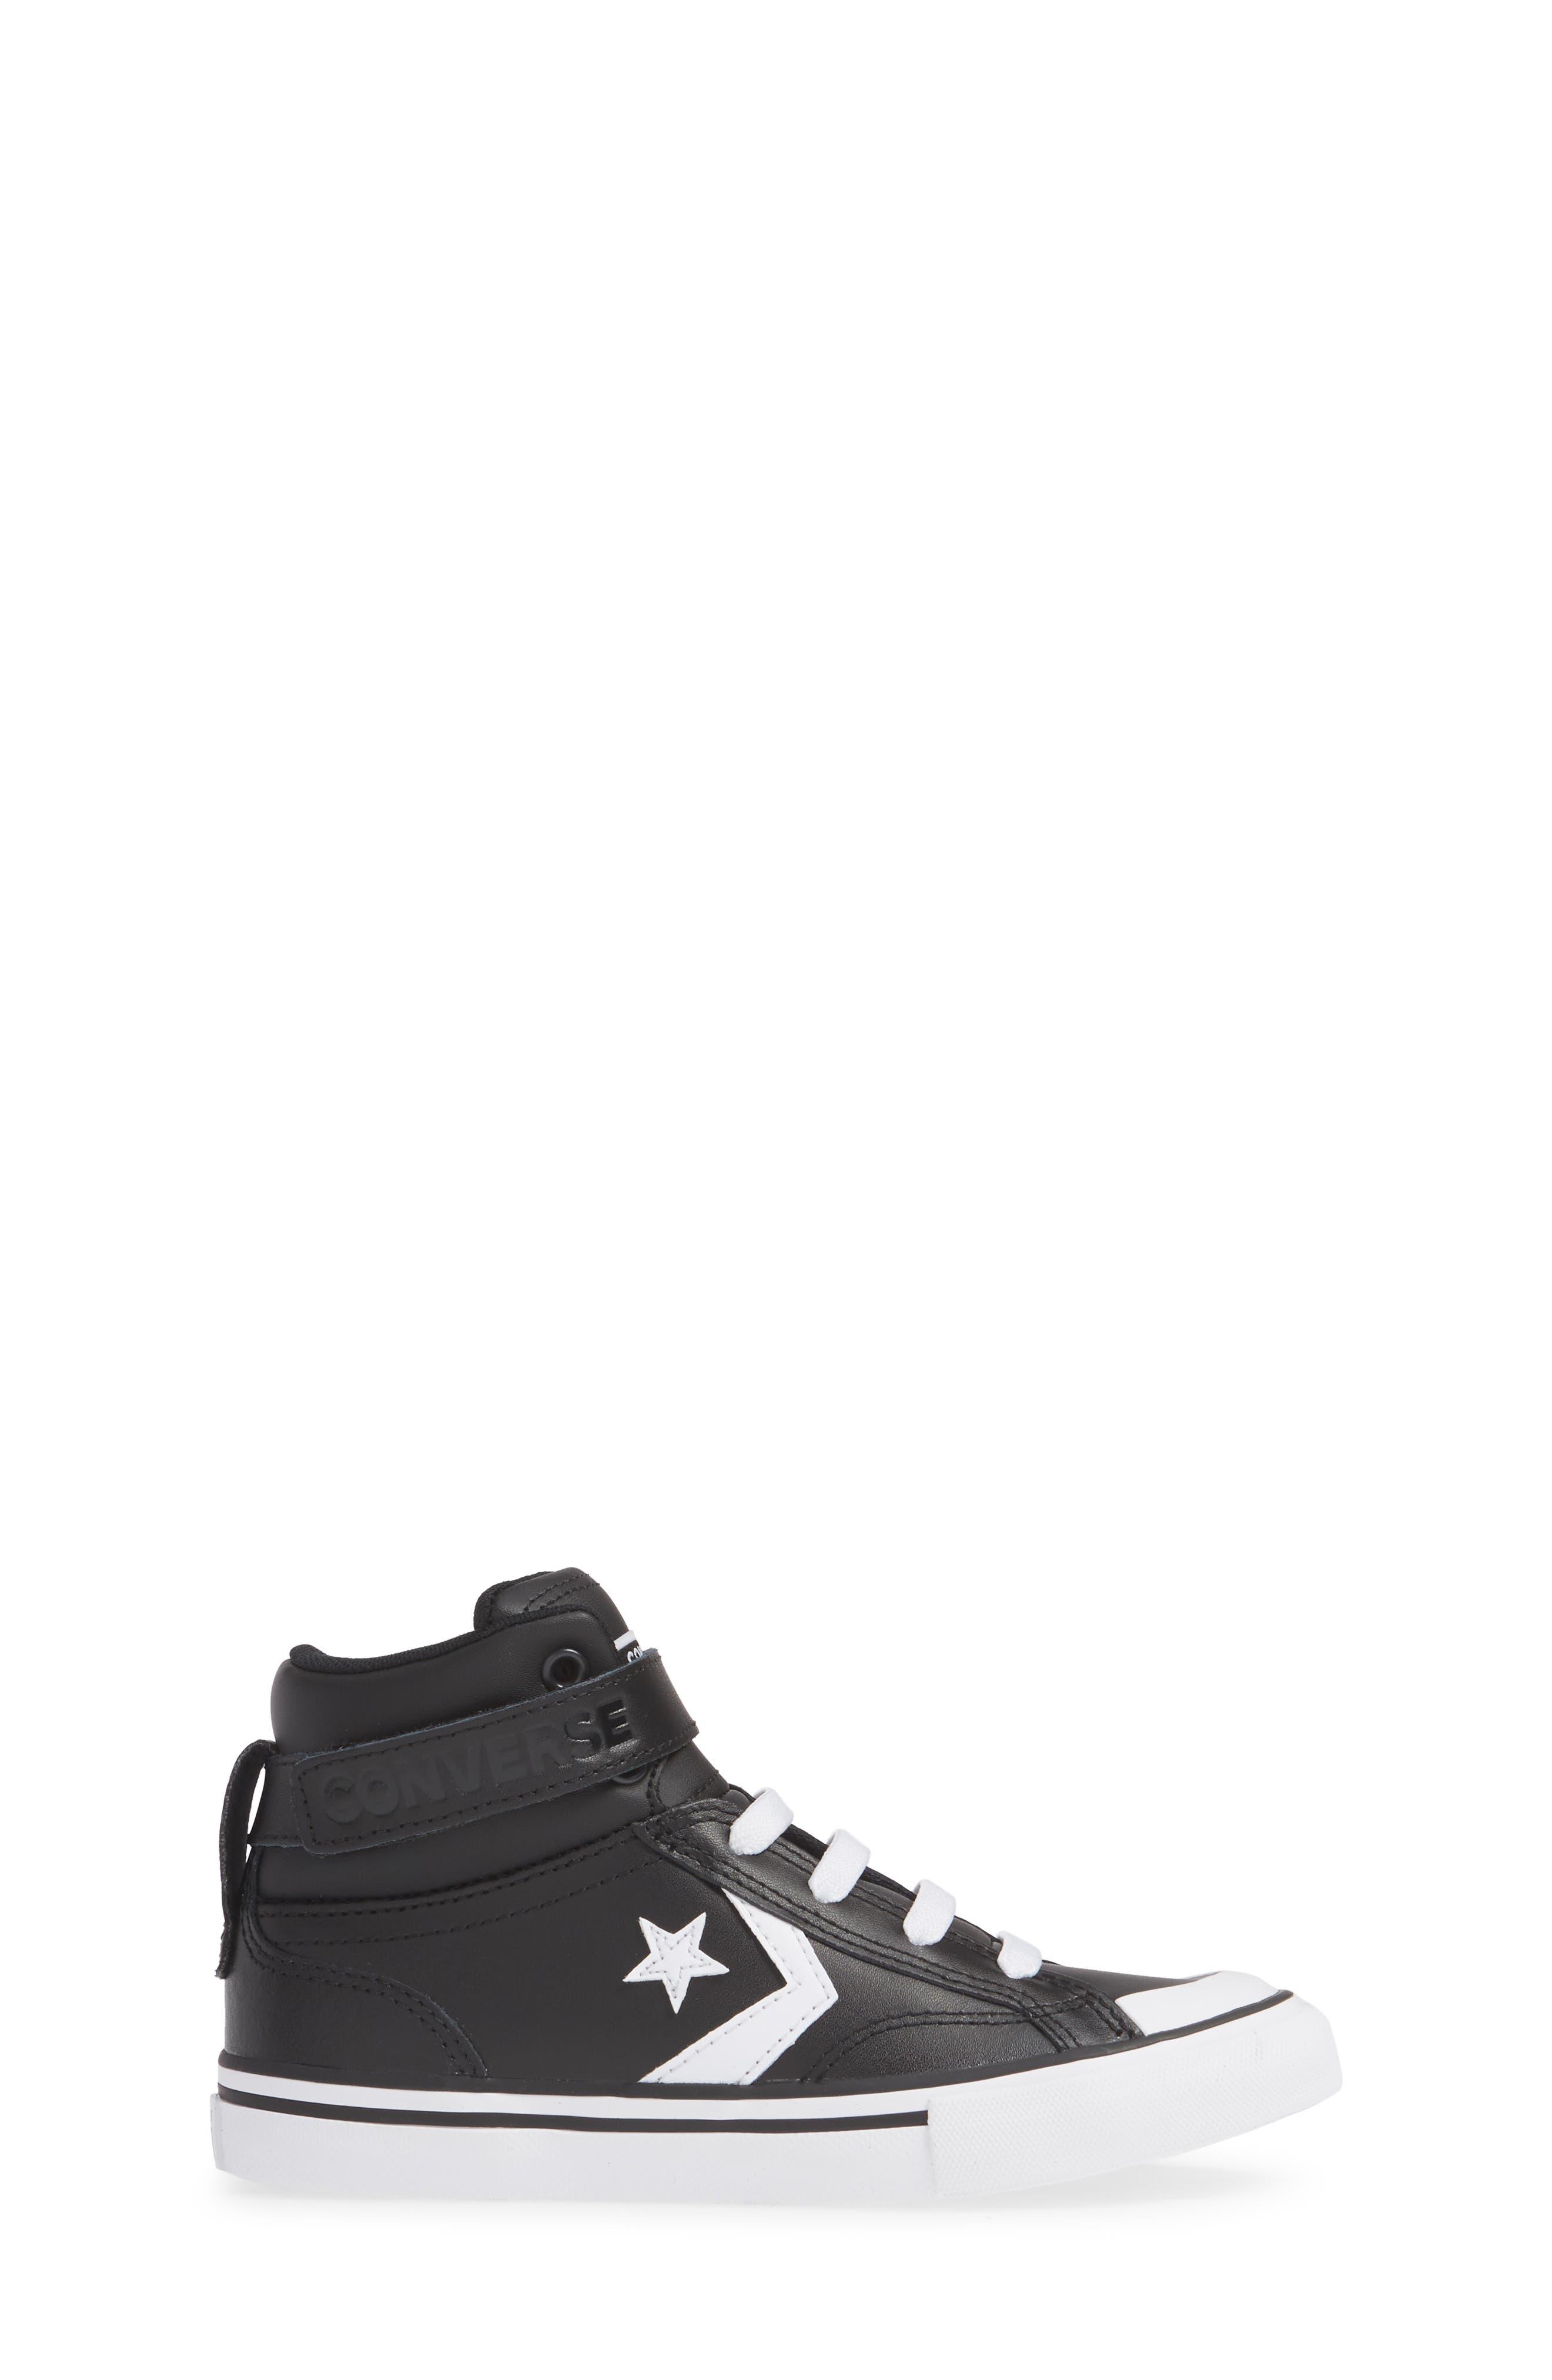 CONVERSE, Pro Blaze High Top Sneaker, Alternate thumbnail 3, color, BLACK/ WHITE/ WHITE